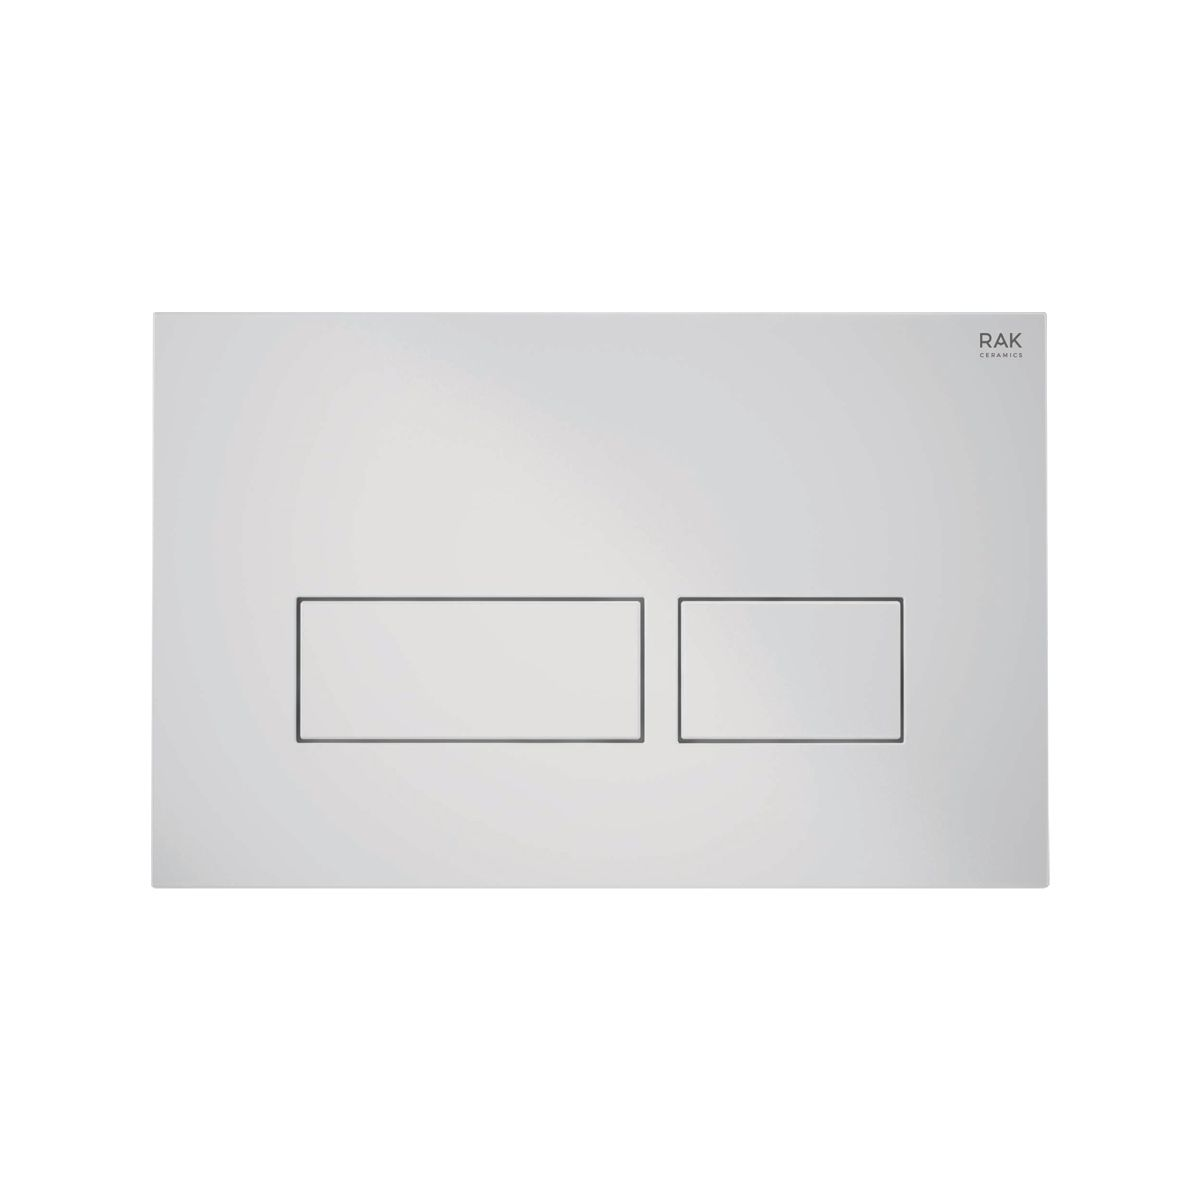 RAK Ecofix White Flush Plate with Rectangular Push Buttons